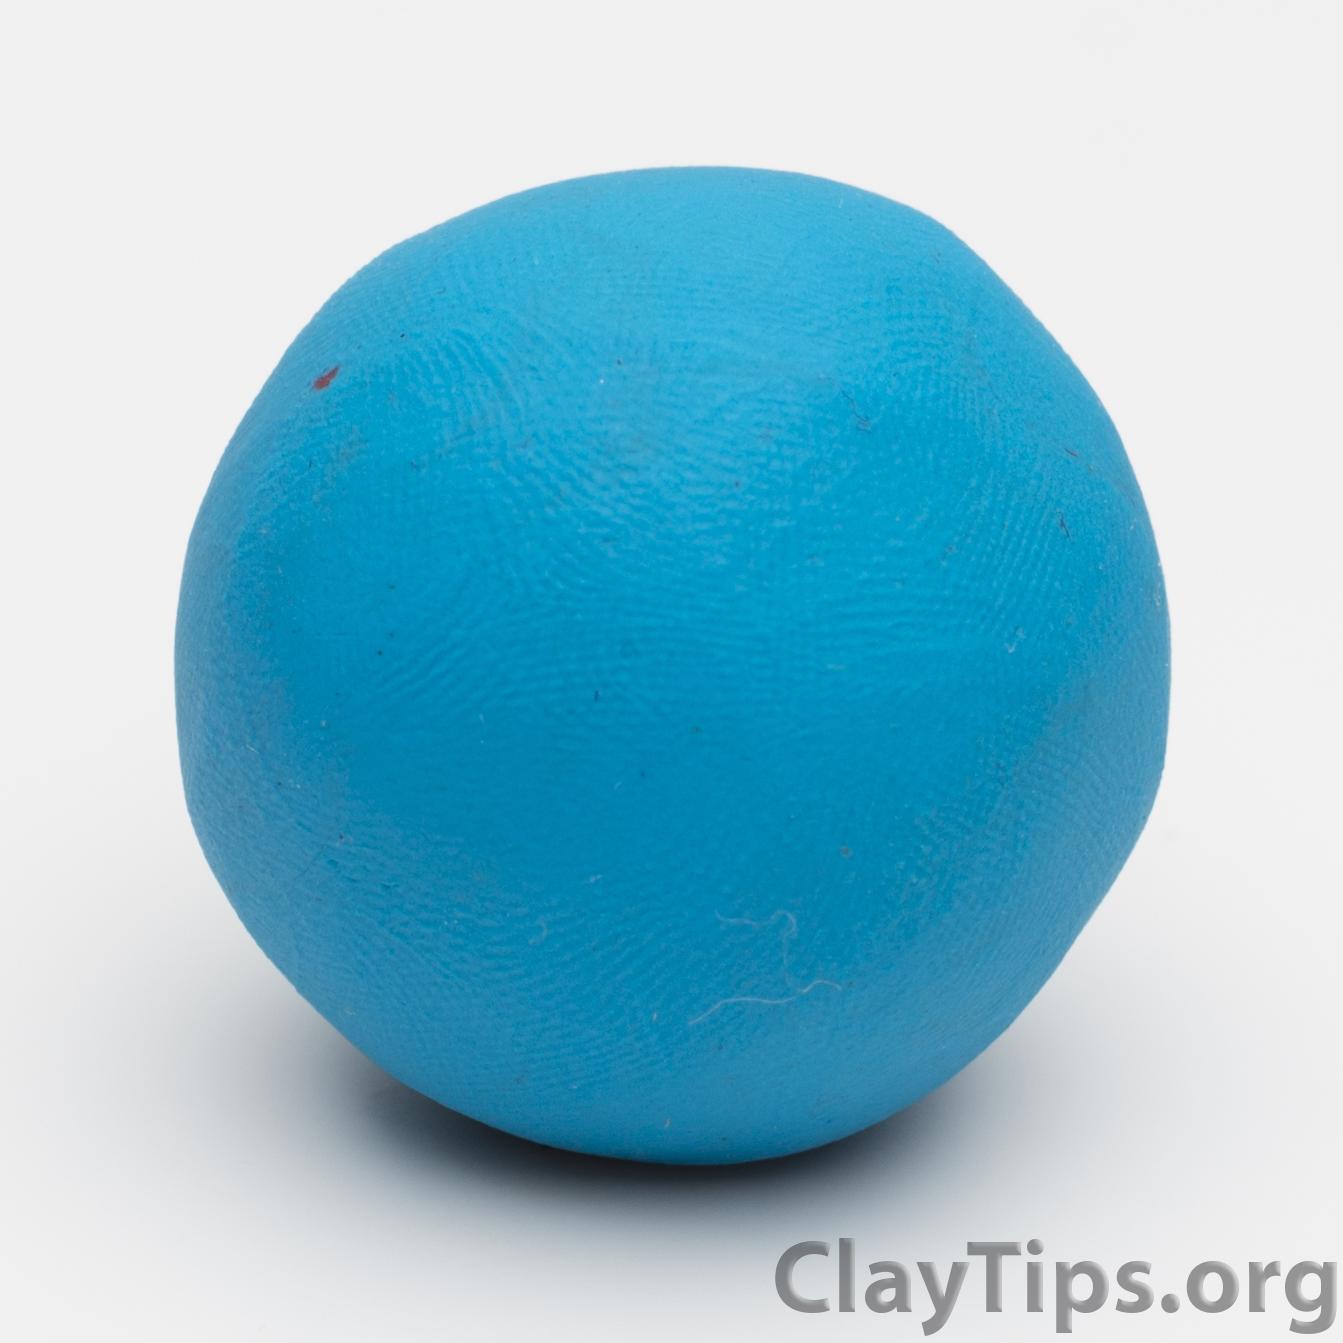 Turquoise Van Aken Plastalina